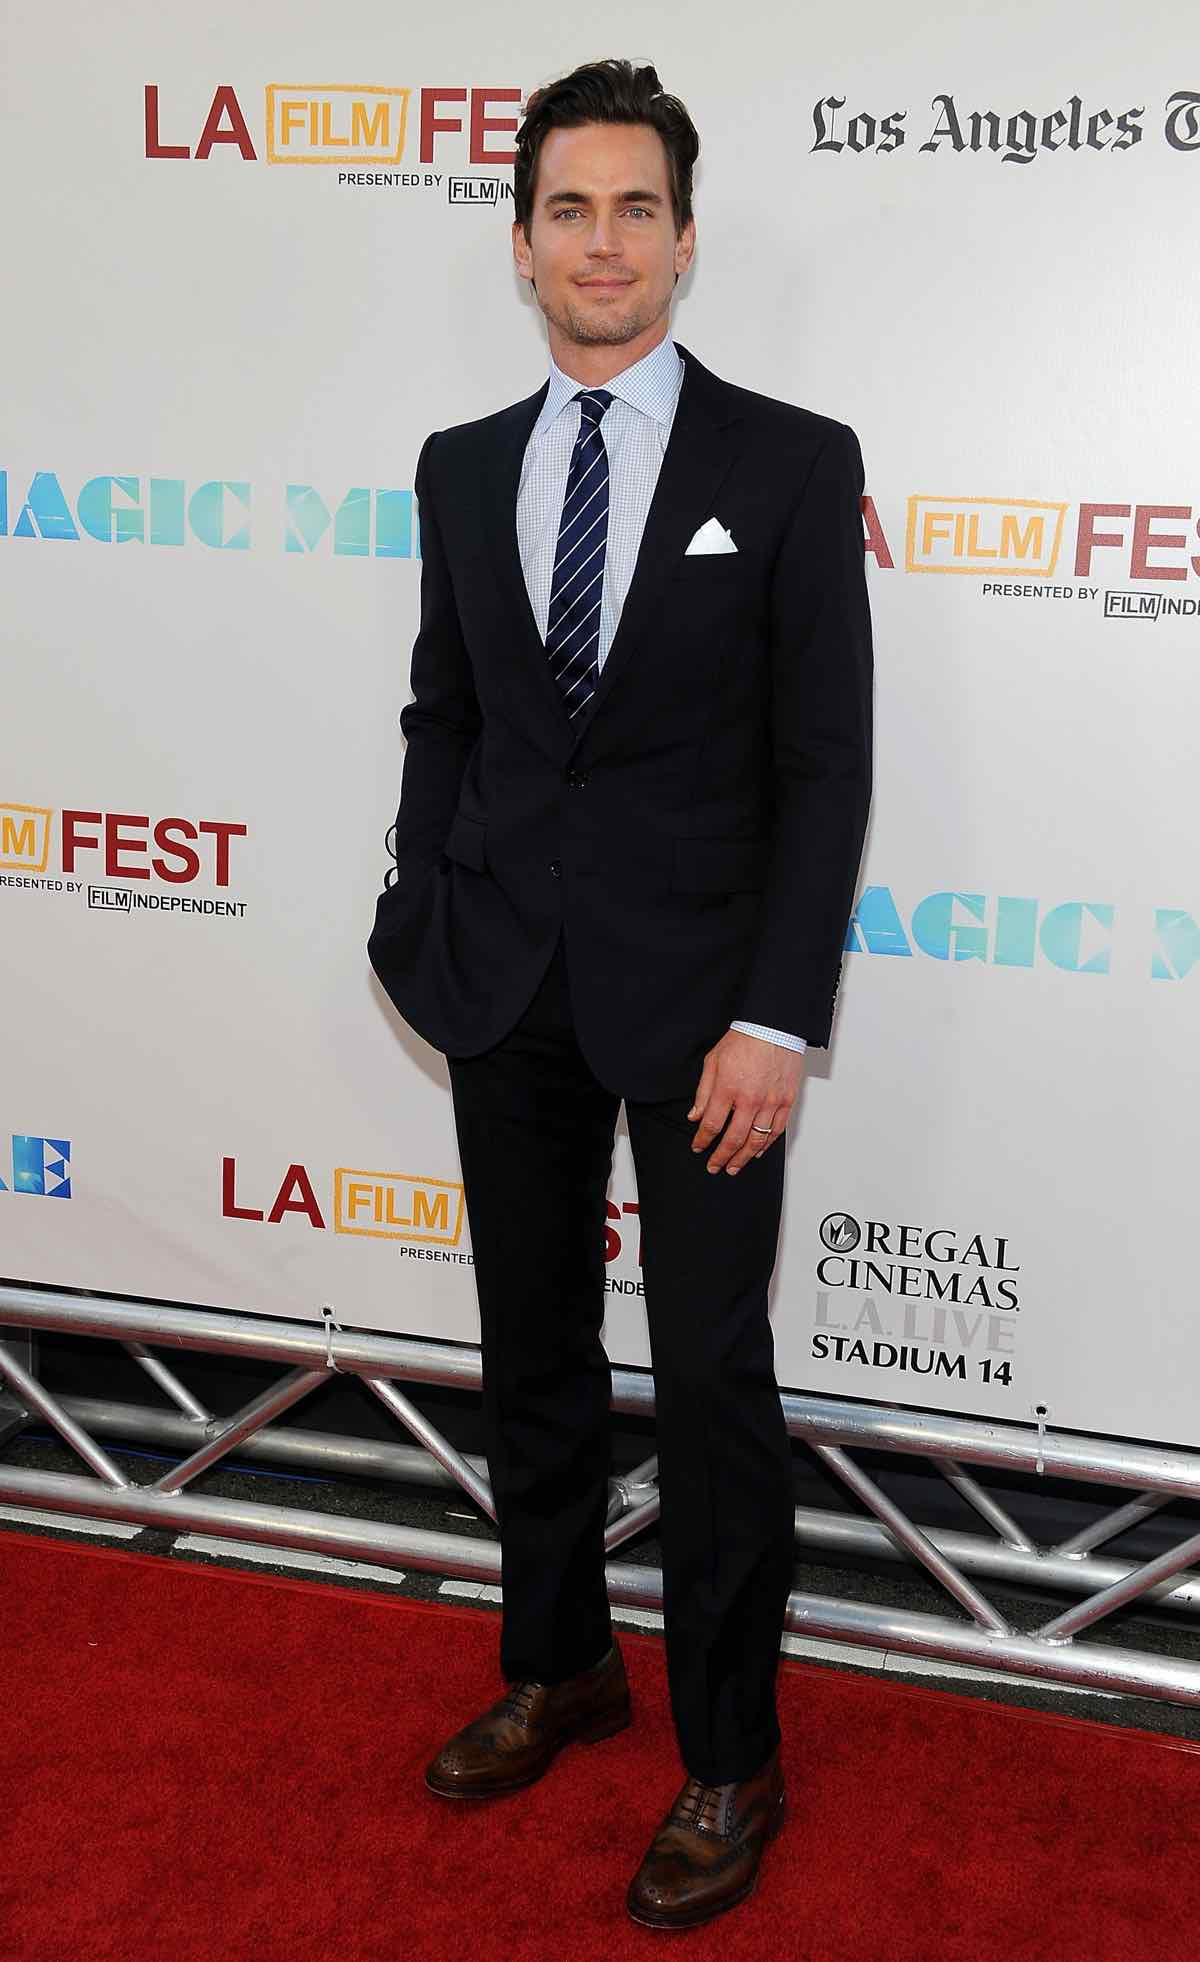 Actor Matt Bomer arrives at the Premiere